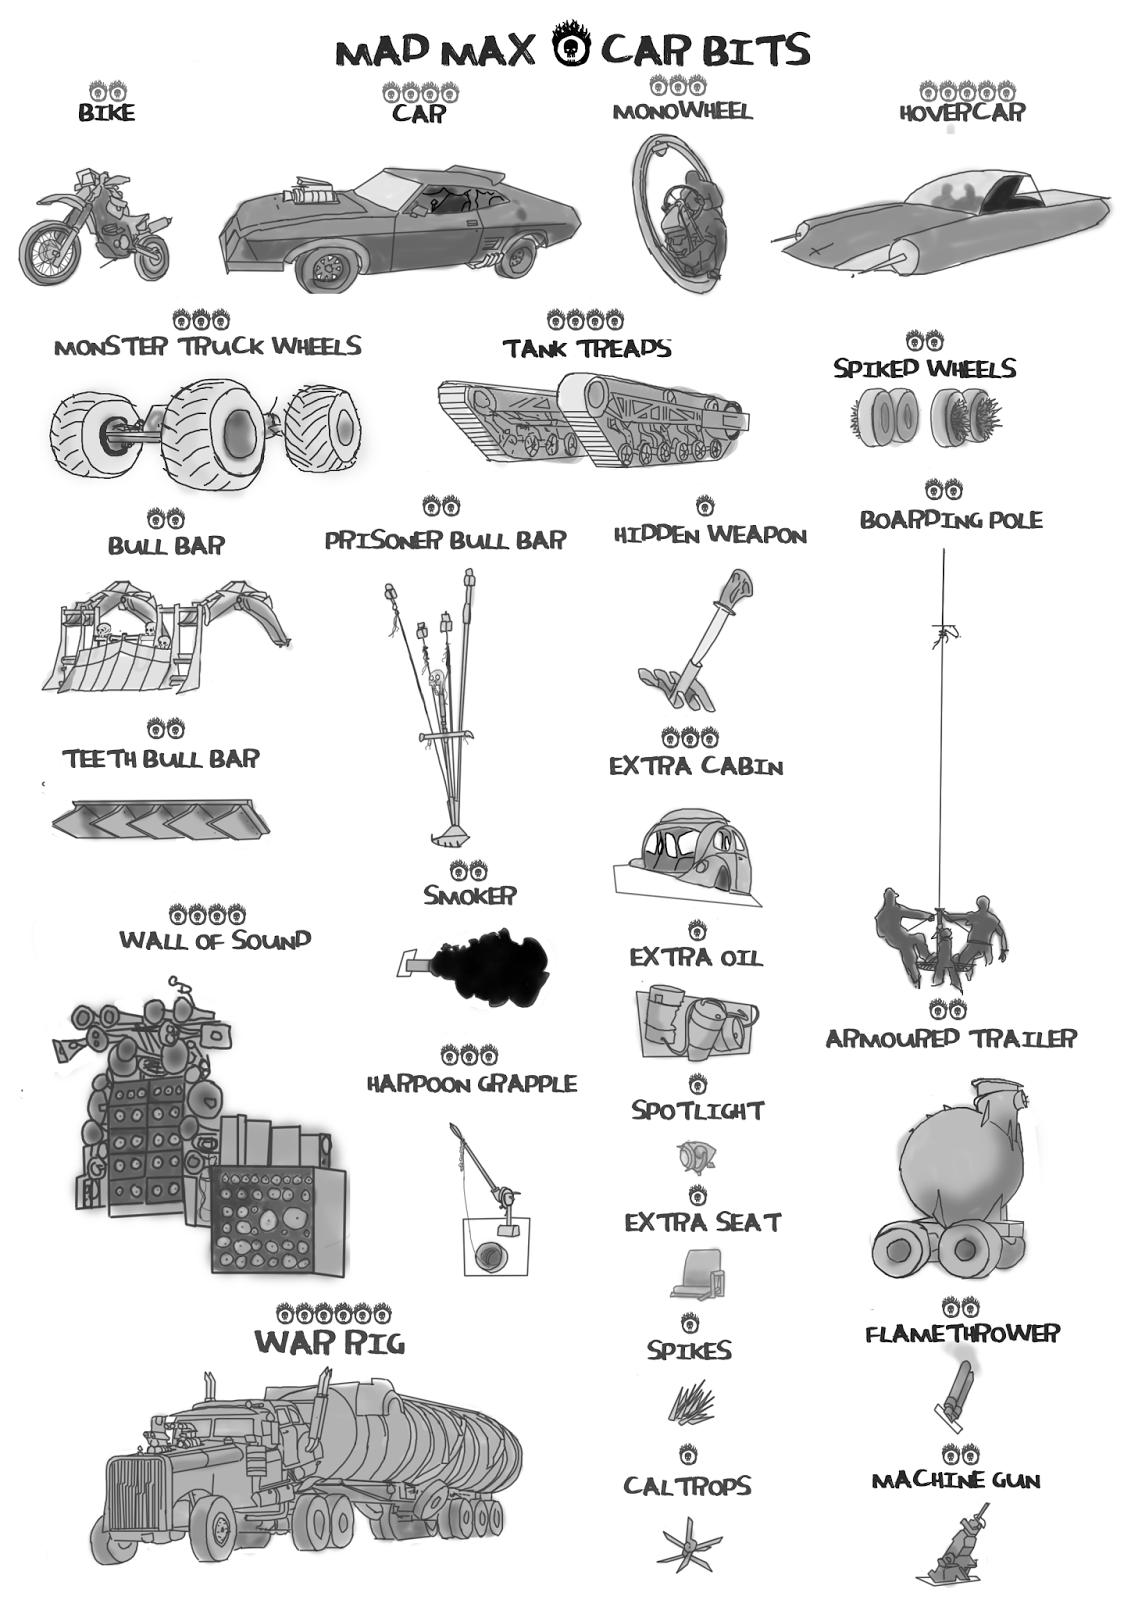 51 Studebaker Wiring Diagram Studebaker Frame Wiring